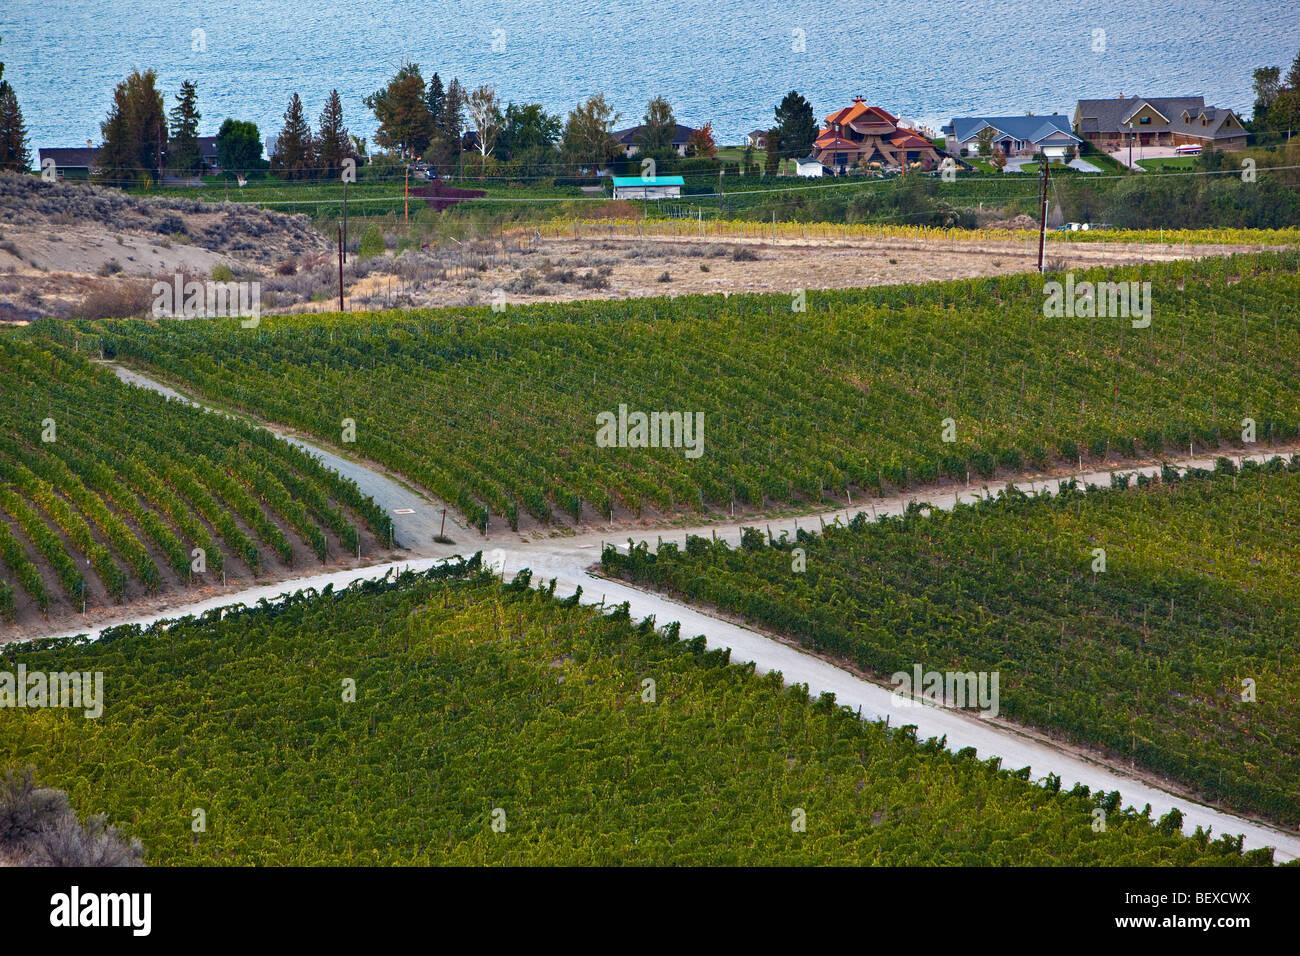 Carrefour entre les vignes près de la ville d'Osoyoos, région Okanagan-Similkameen, Okanagan, Colombie Photo Stock